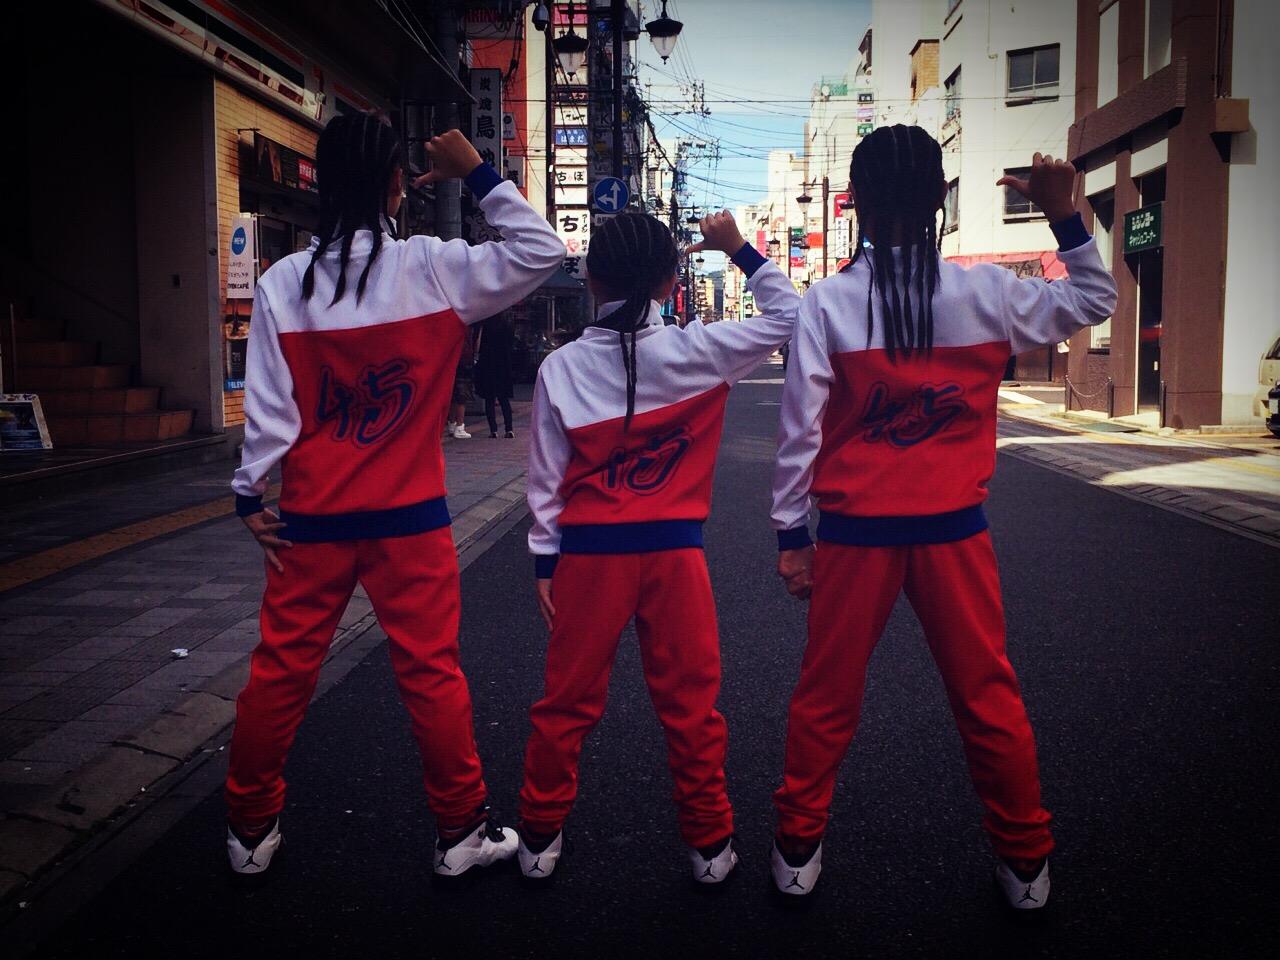 dance_labo_danlabo_studio_ダンス_スタジオ_ジャージ_セットアップ_kids_キッズ_rinola_1